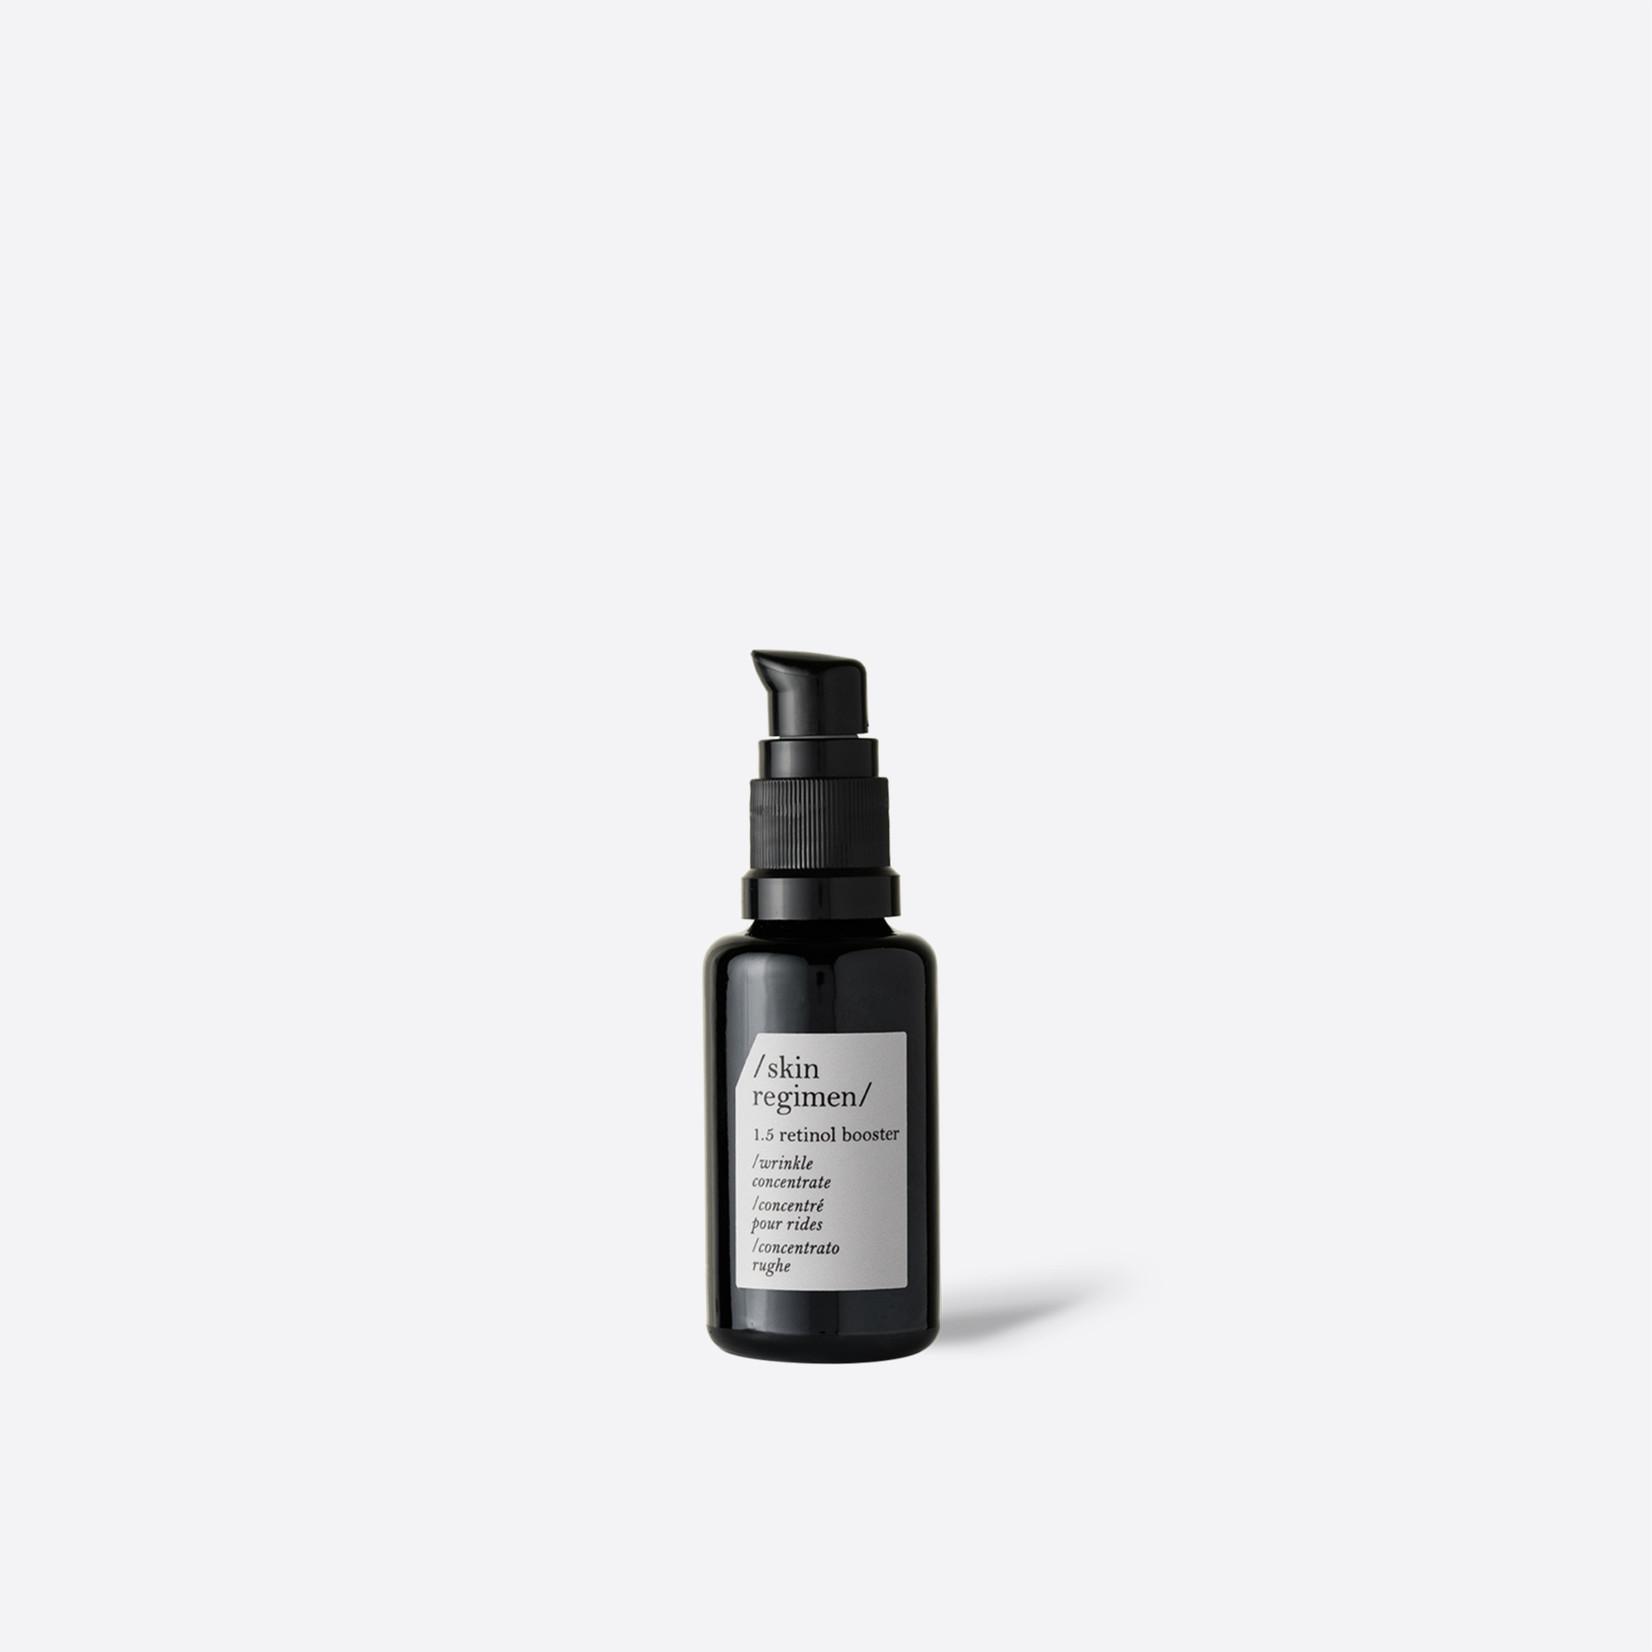 Comfort Zone Skin Regimen Retinol Booster